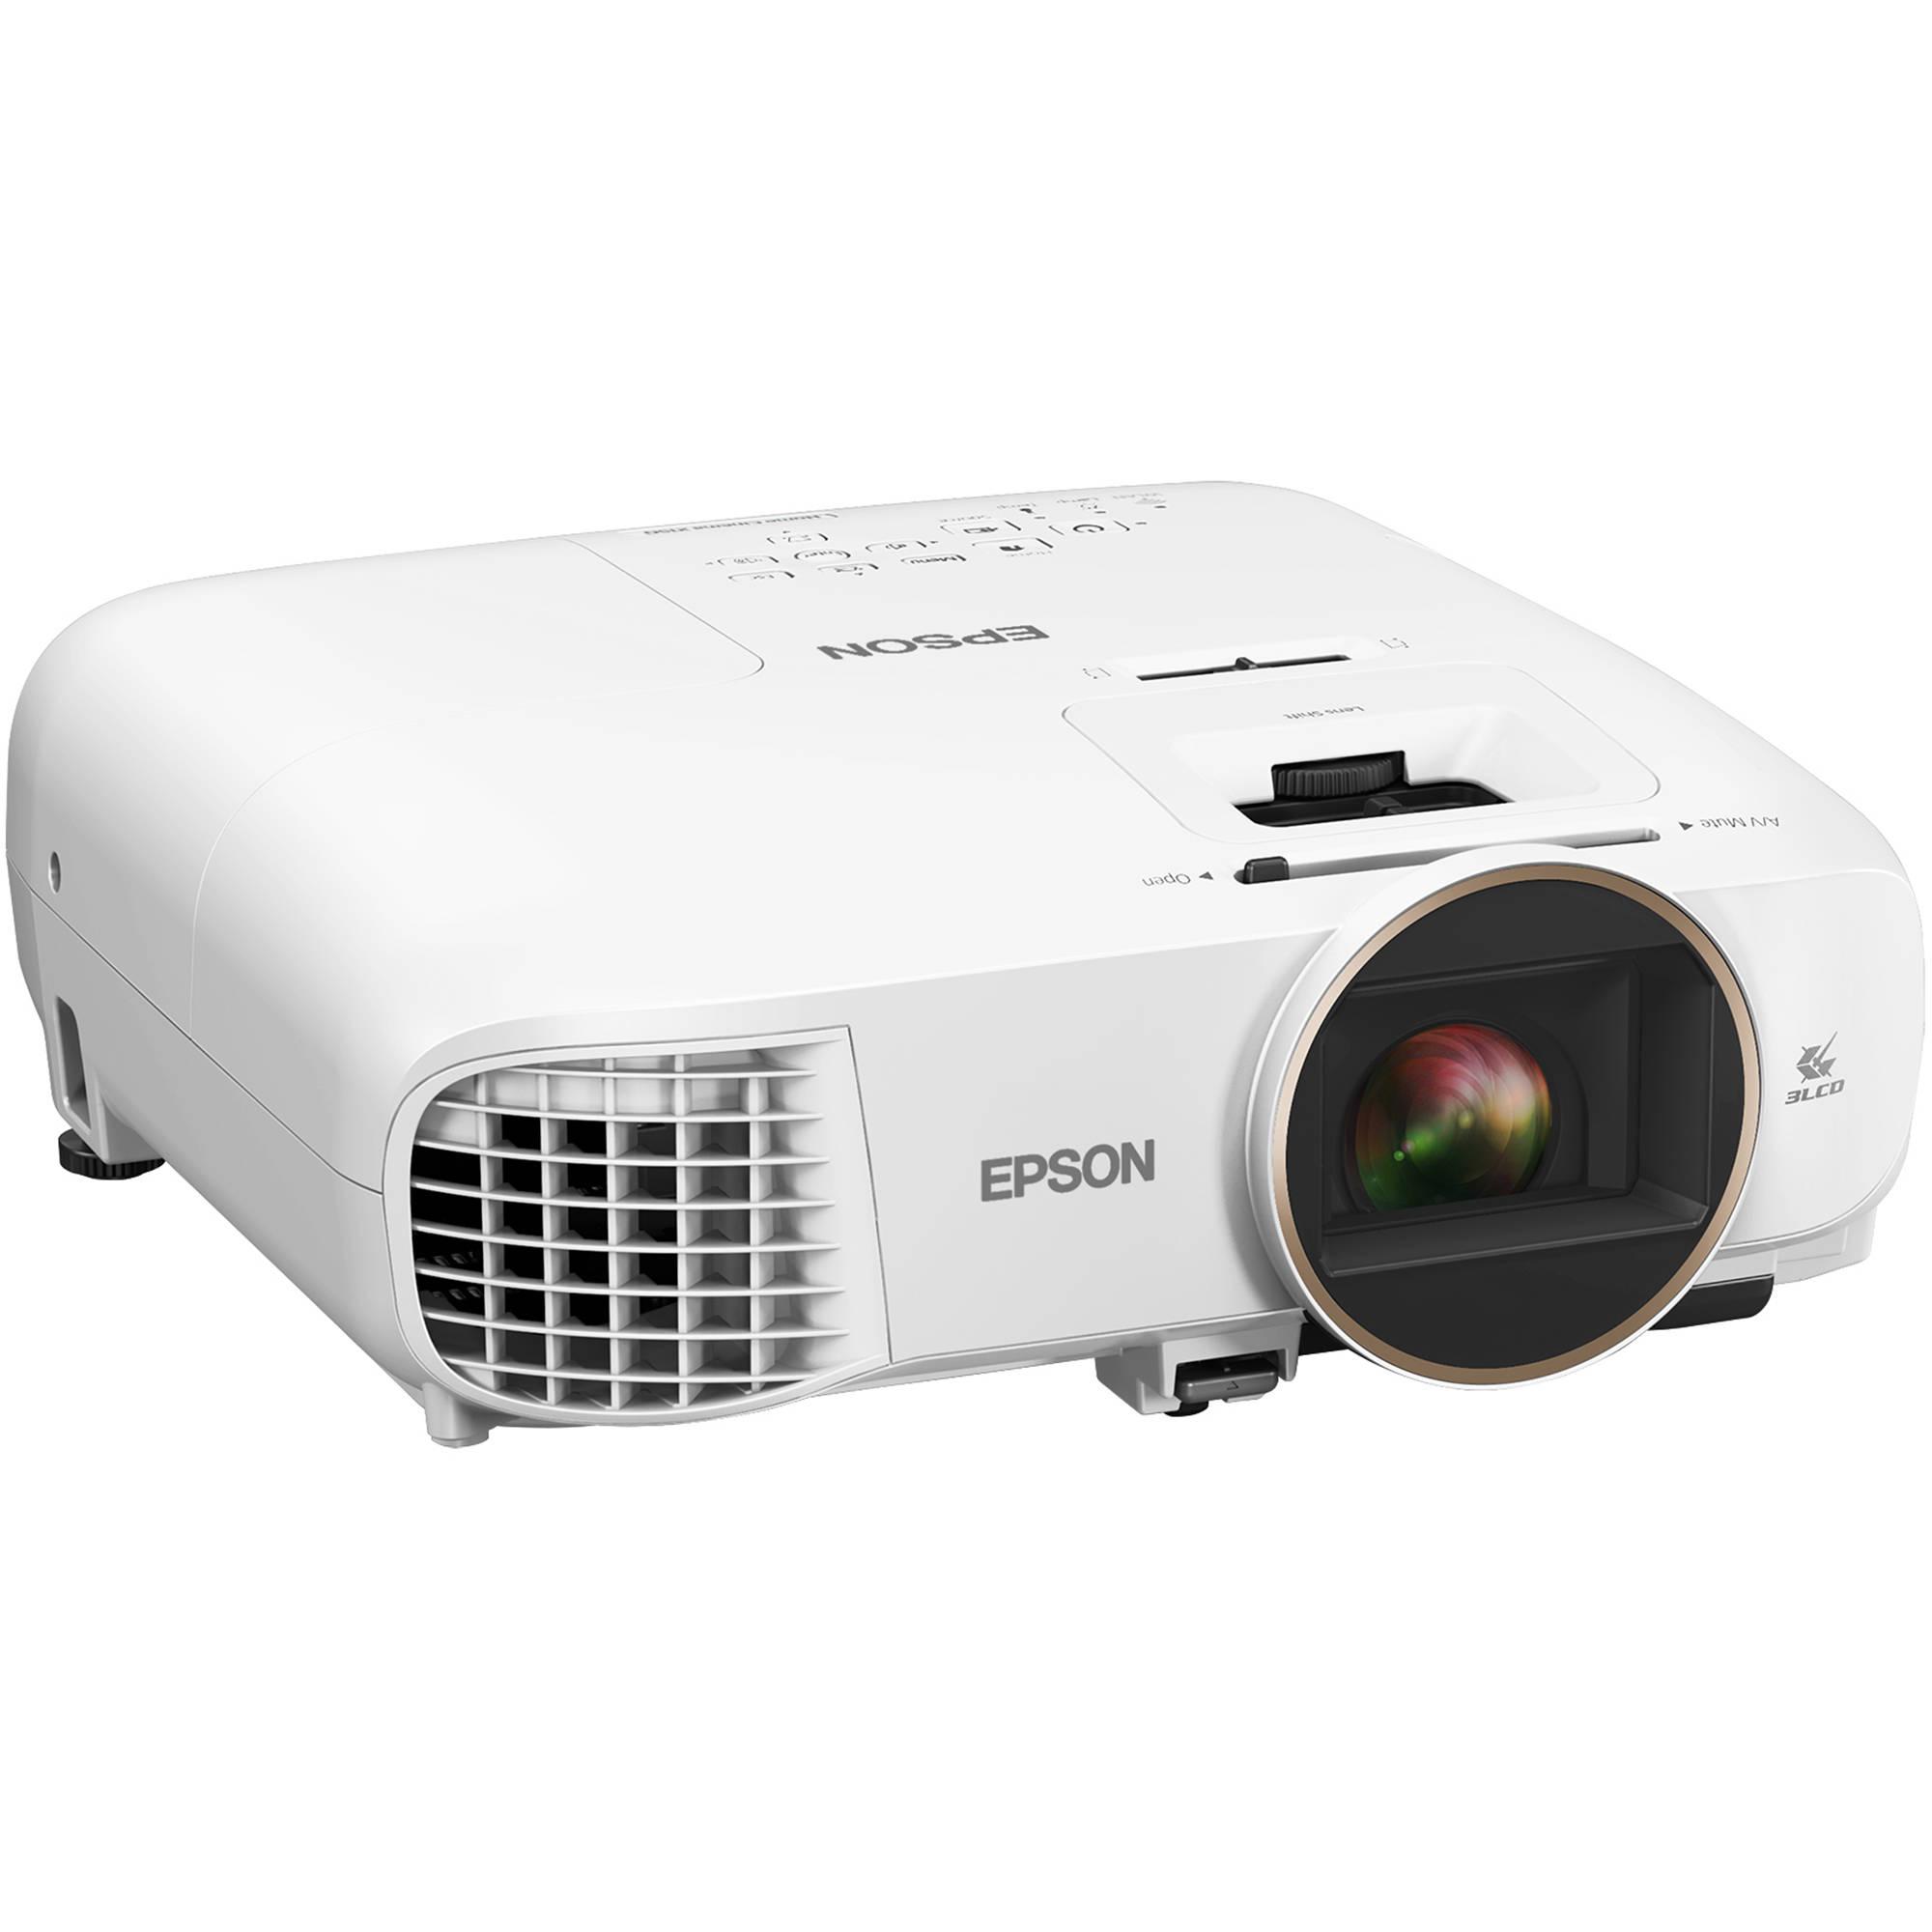 Fastfox Hd Projector Full Color 720p 3000 Lumens Analog Tv: Epson PowerLite Home Cinema 2150 Full HD 3LCD V11H852020 B&H